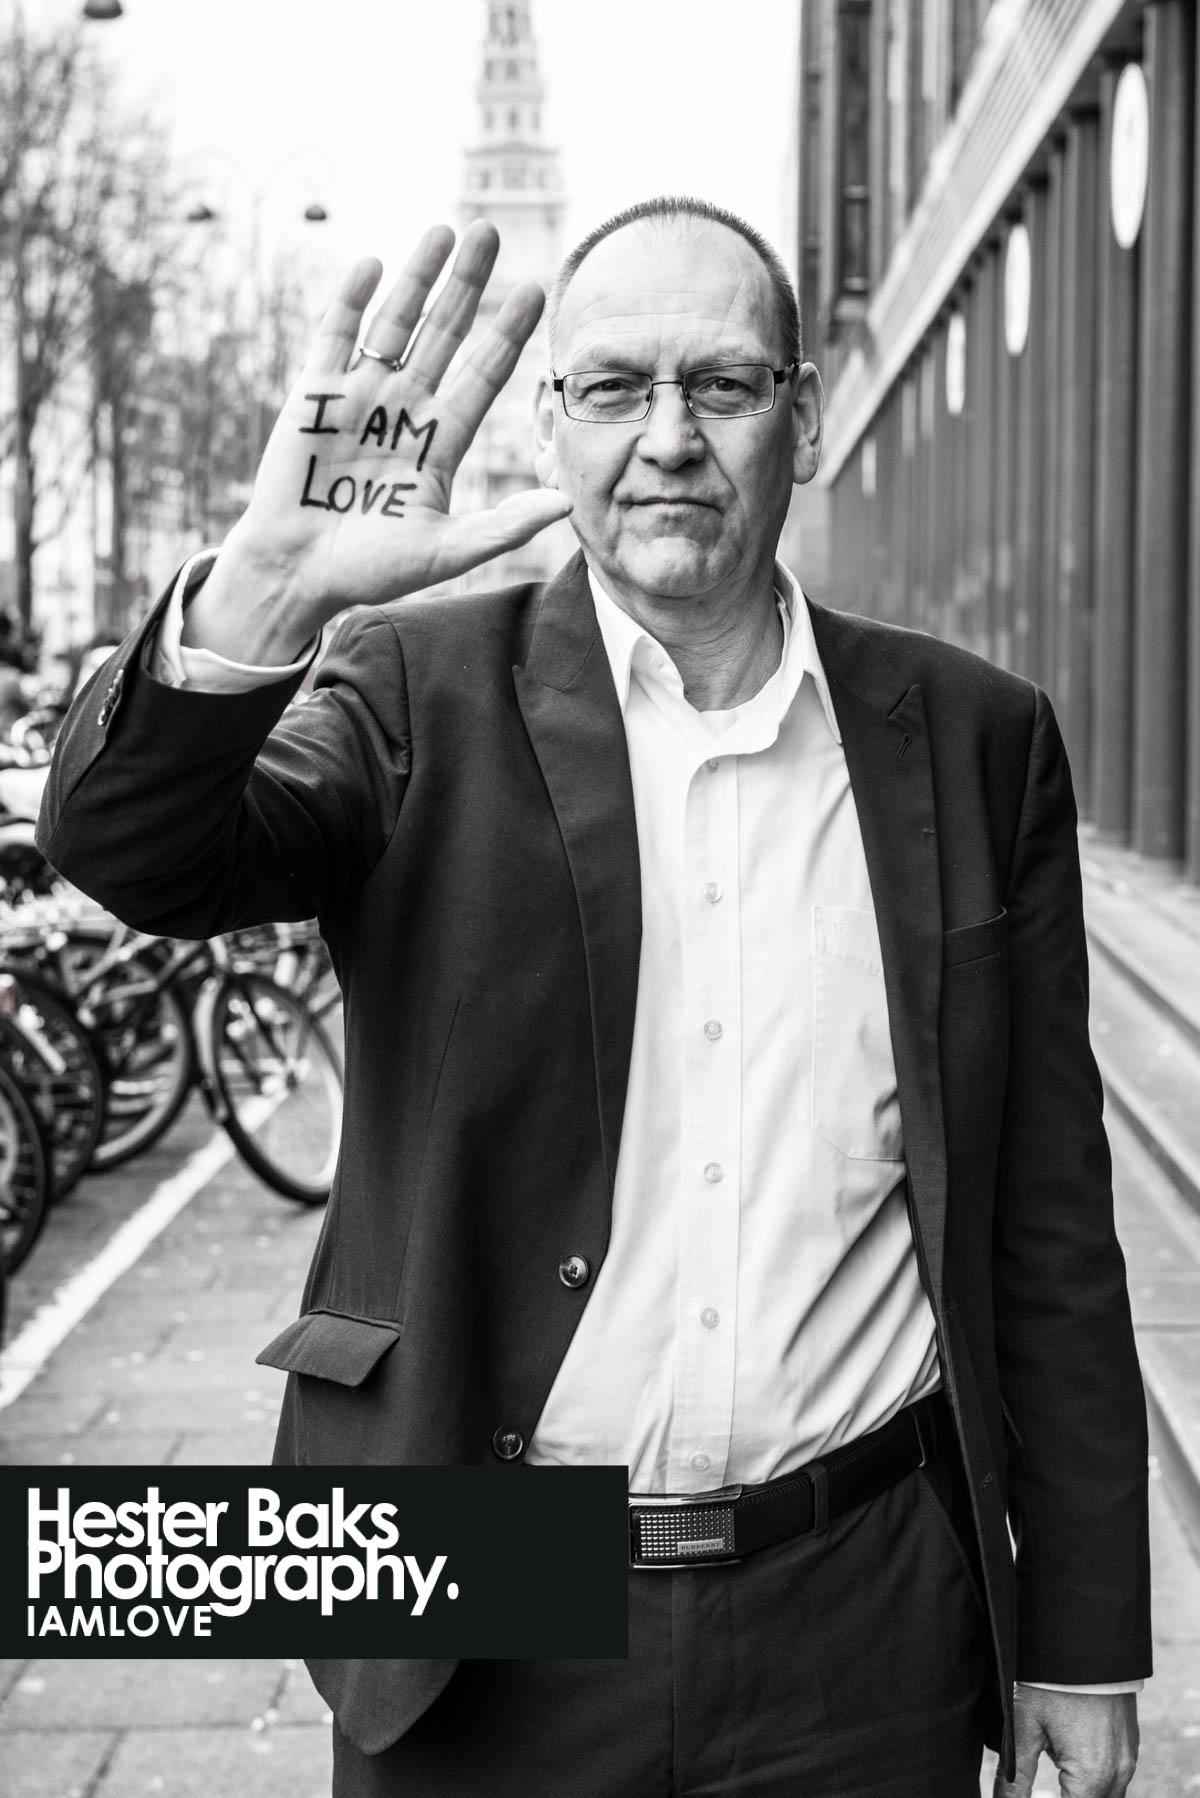 Hans Duimelaar (1 van 1)